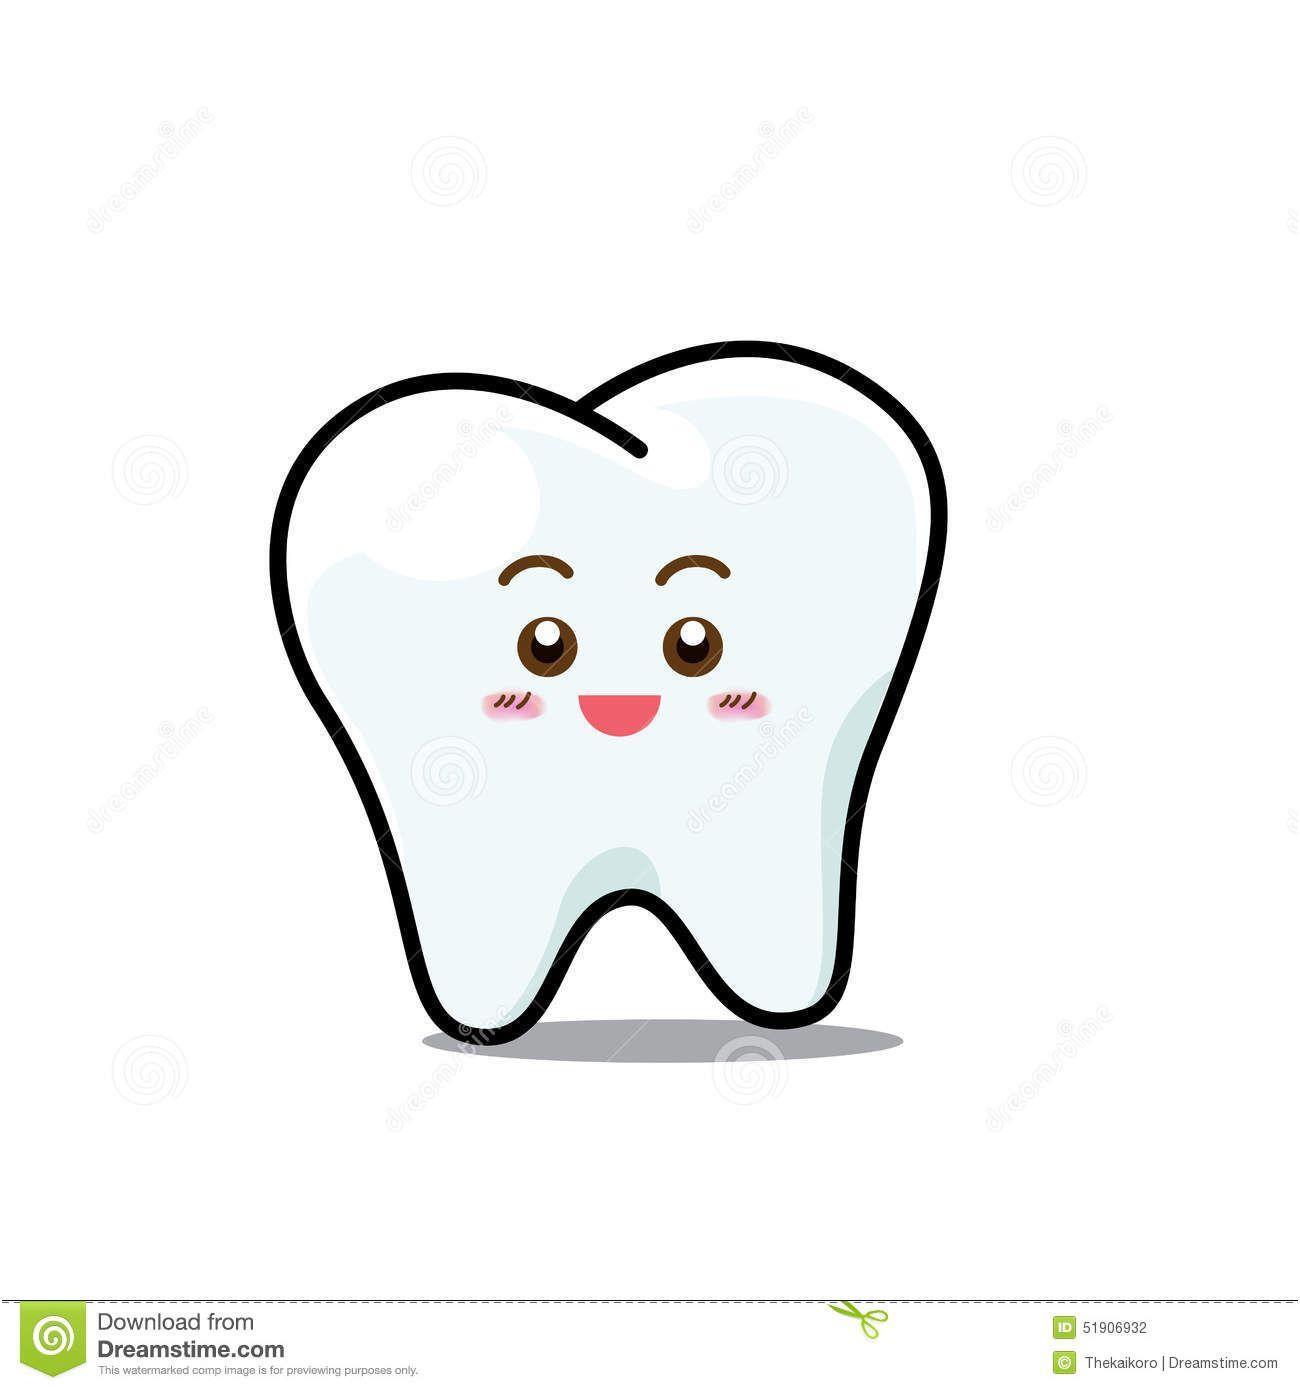 13 Intelligent Dessin Brossage De Dents Gallery Check more